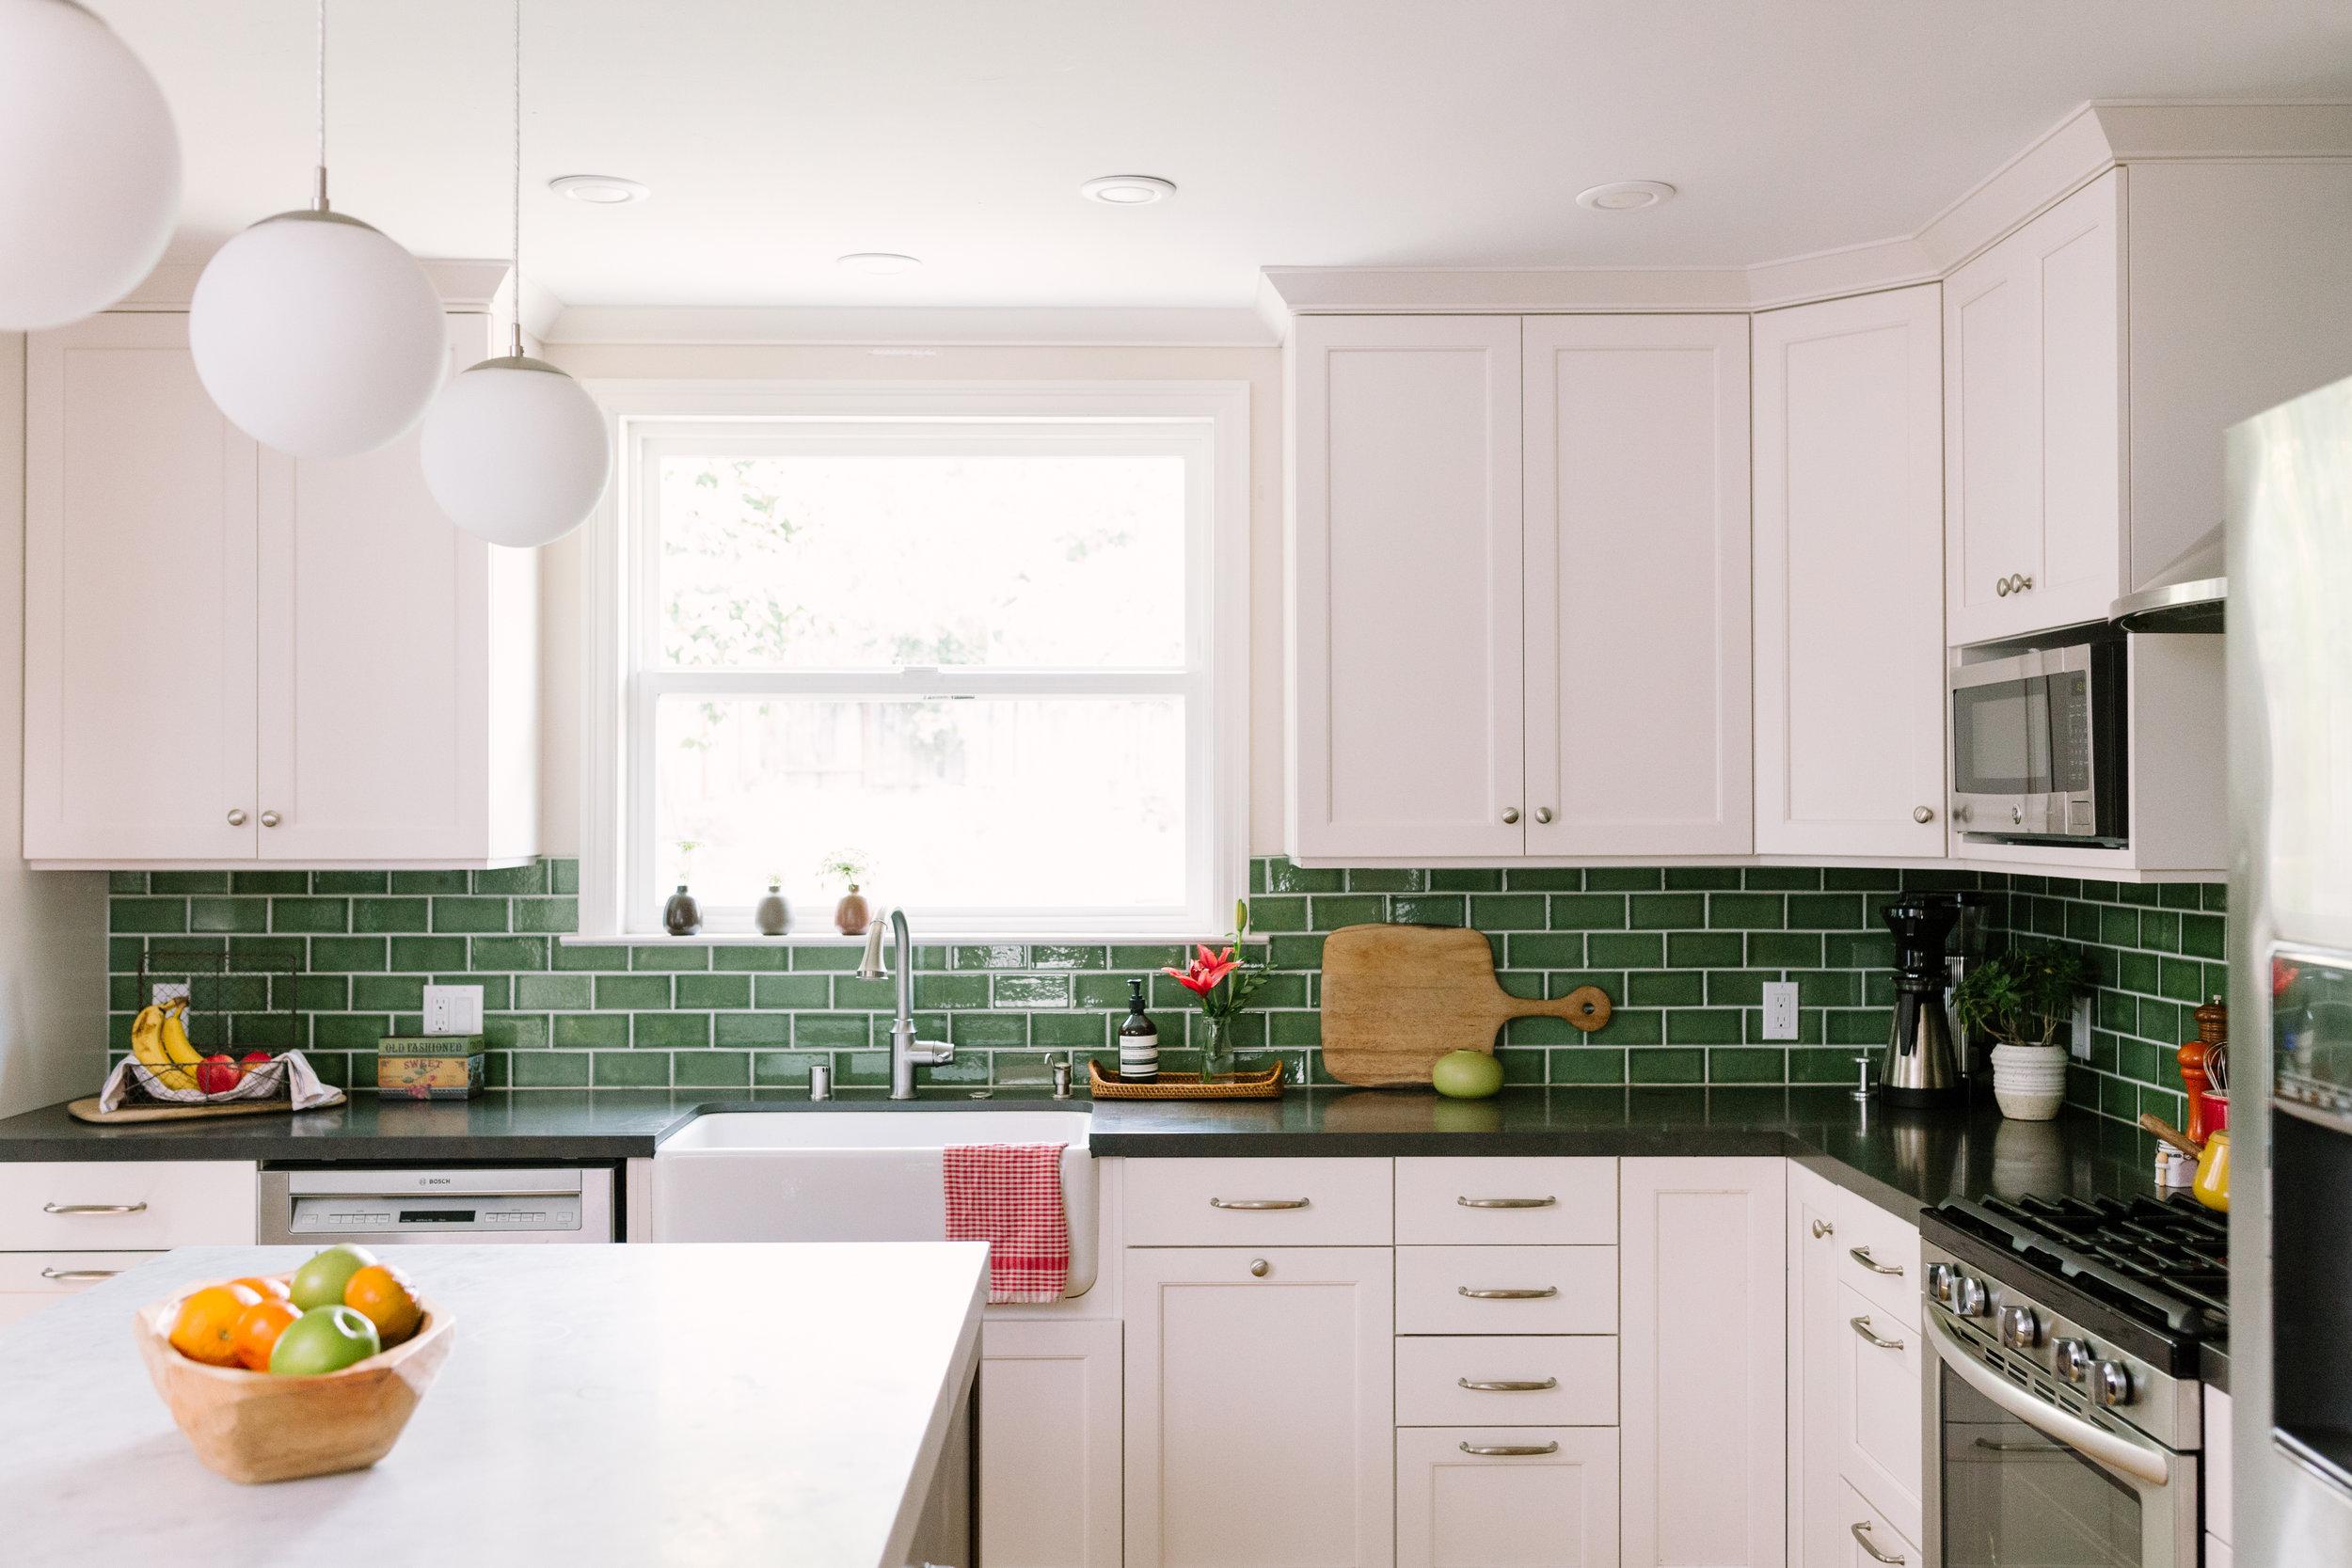 burlingame kitchen remodel julia goodwin design